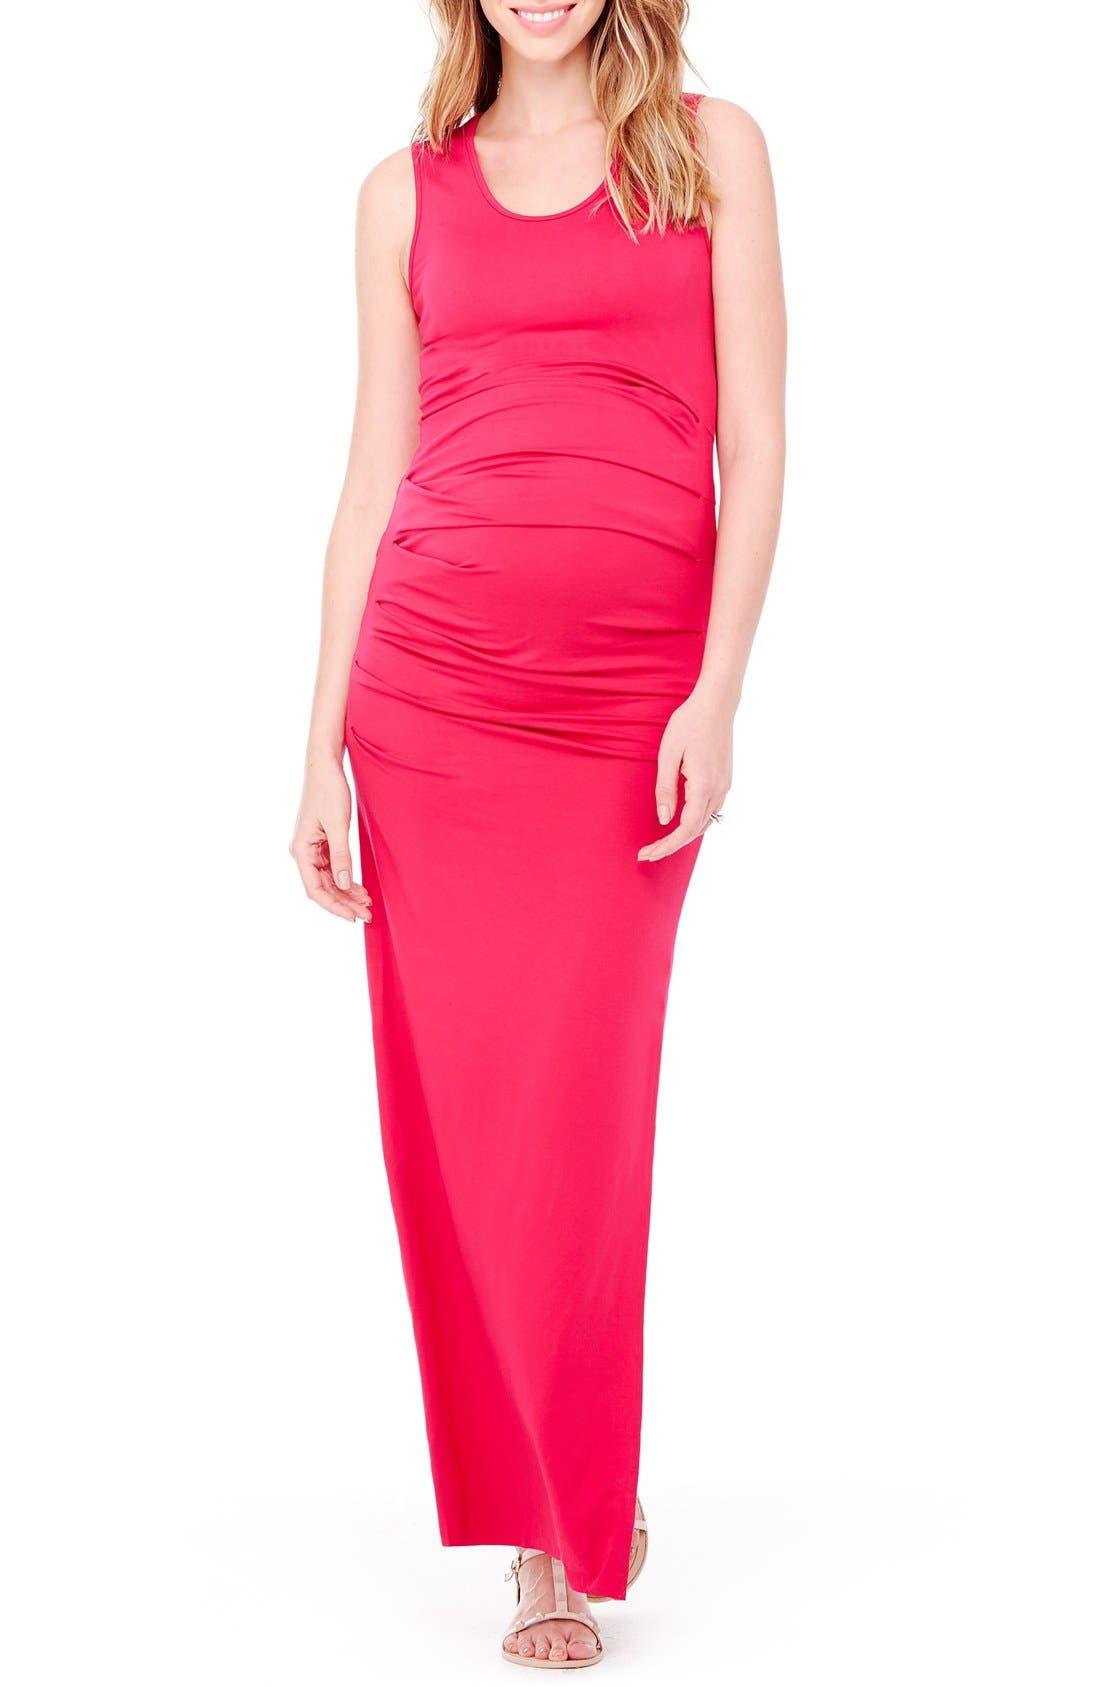 Main Image - Ingrid & Isabel® Striped Tank Maternity Maxi Dress